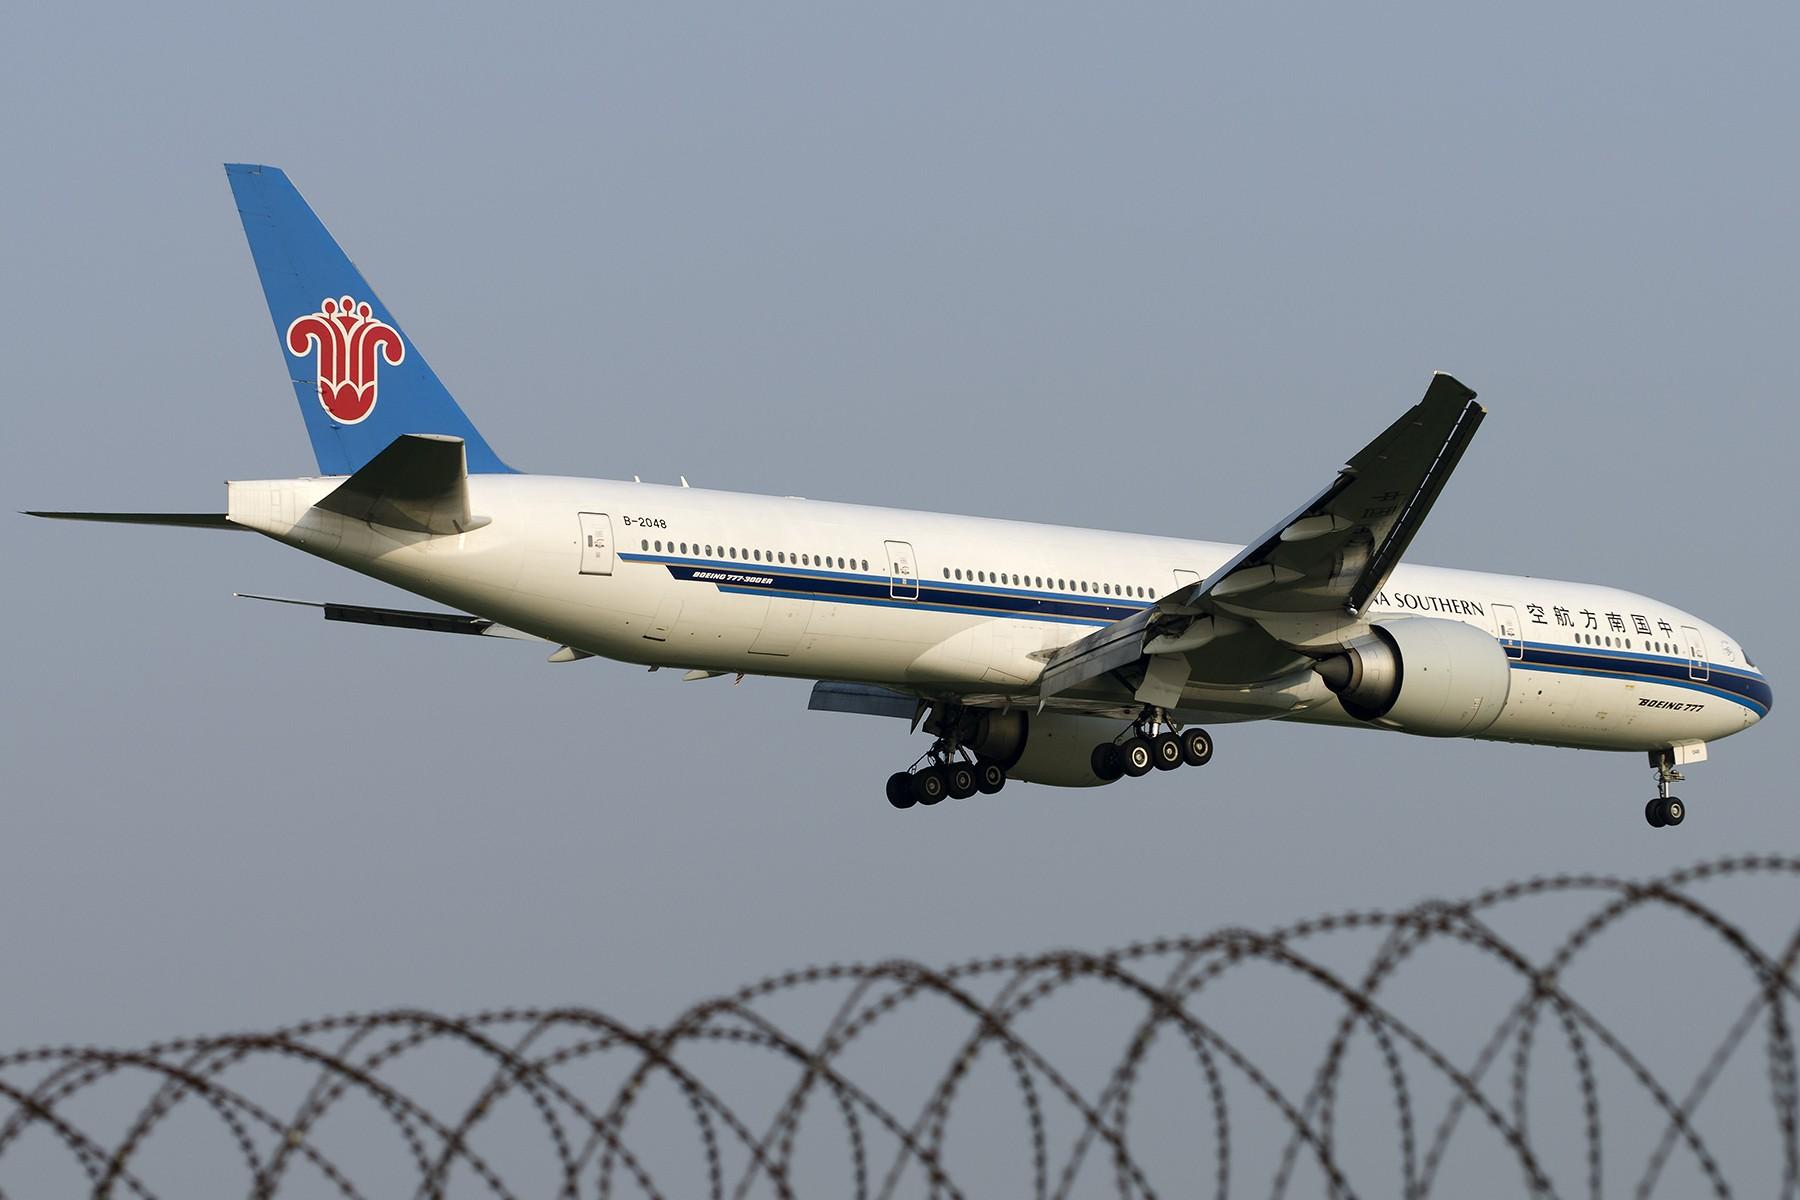 Re:[原创][原创]【SHA拍机*1800大图】4月拍的了,记得那天好货还挺多 BOEING 777-300ER B-2048 中国上海虹桥国际机场